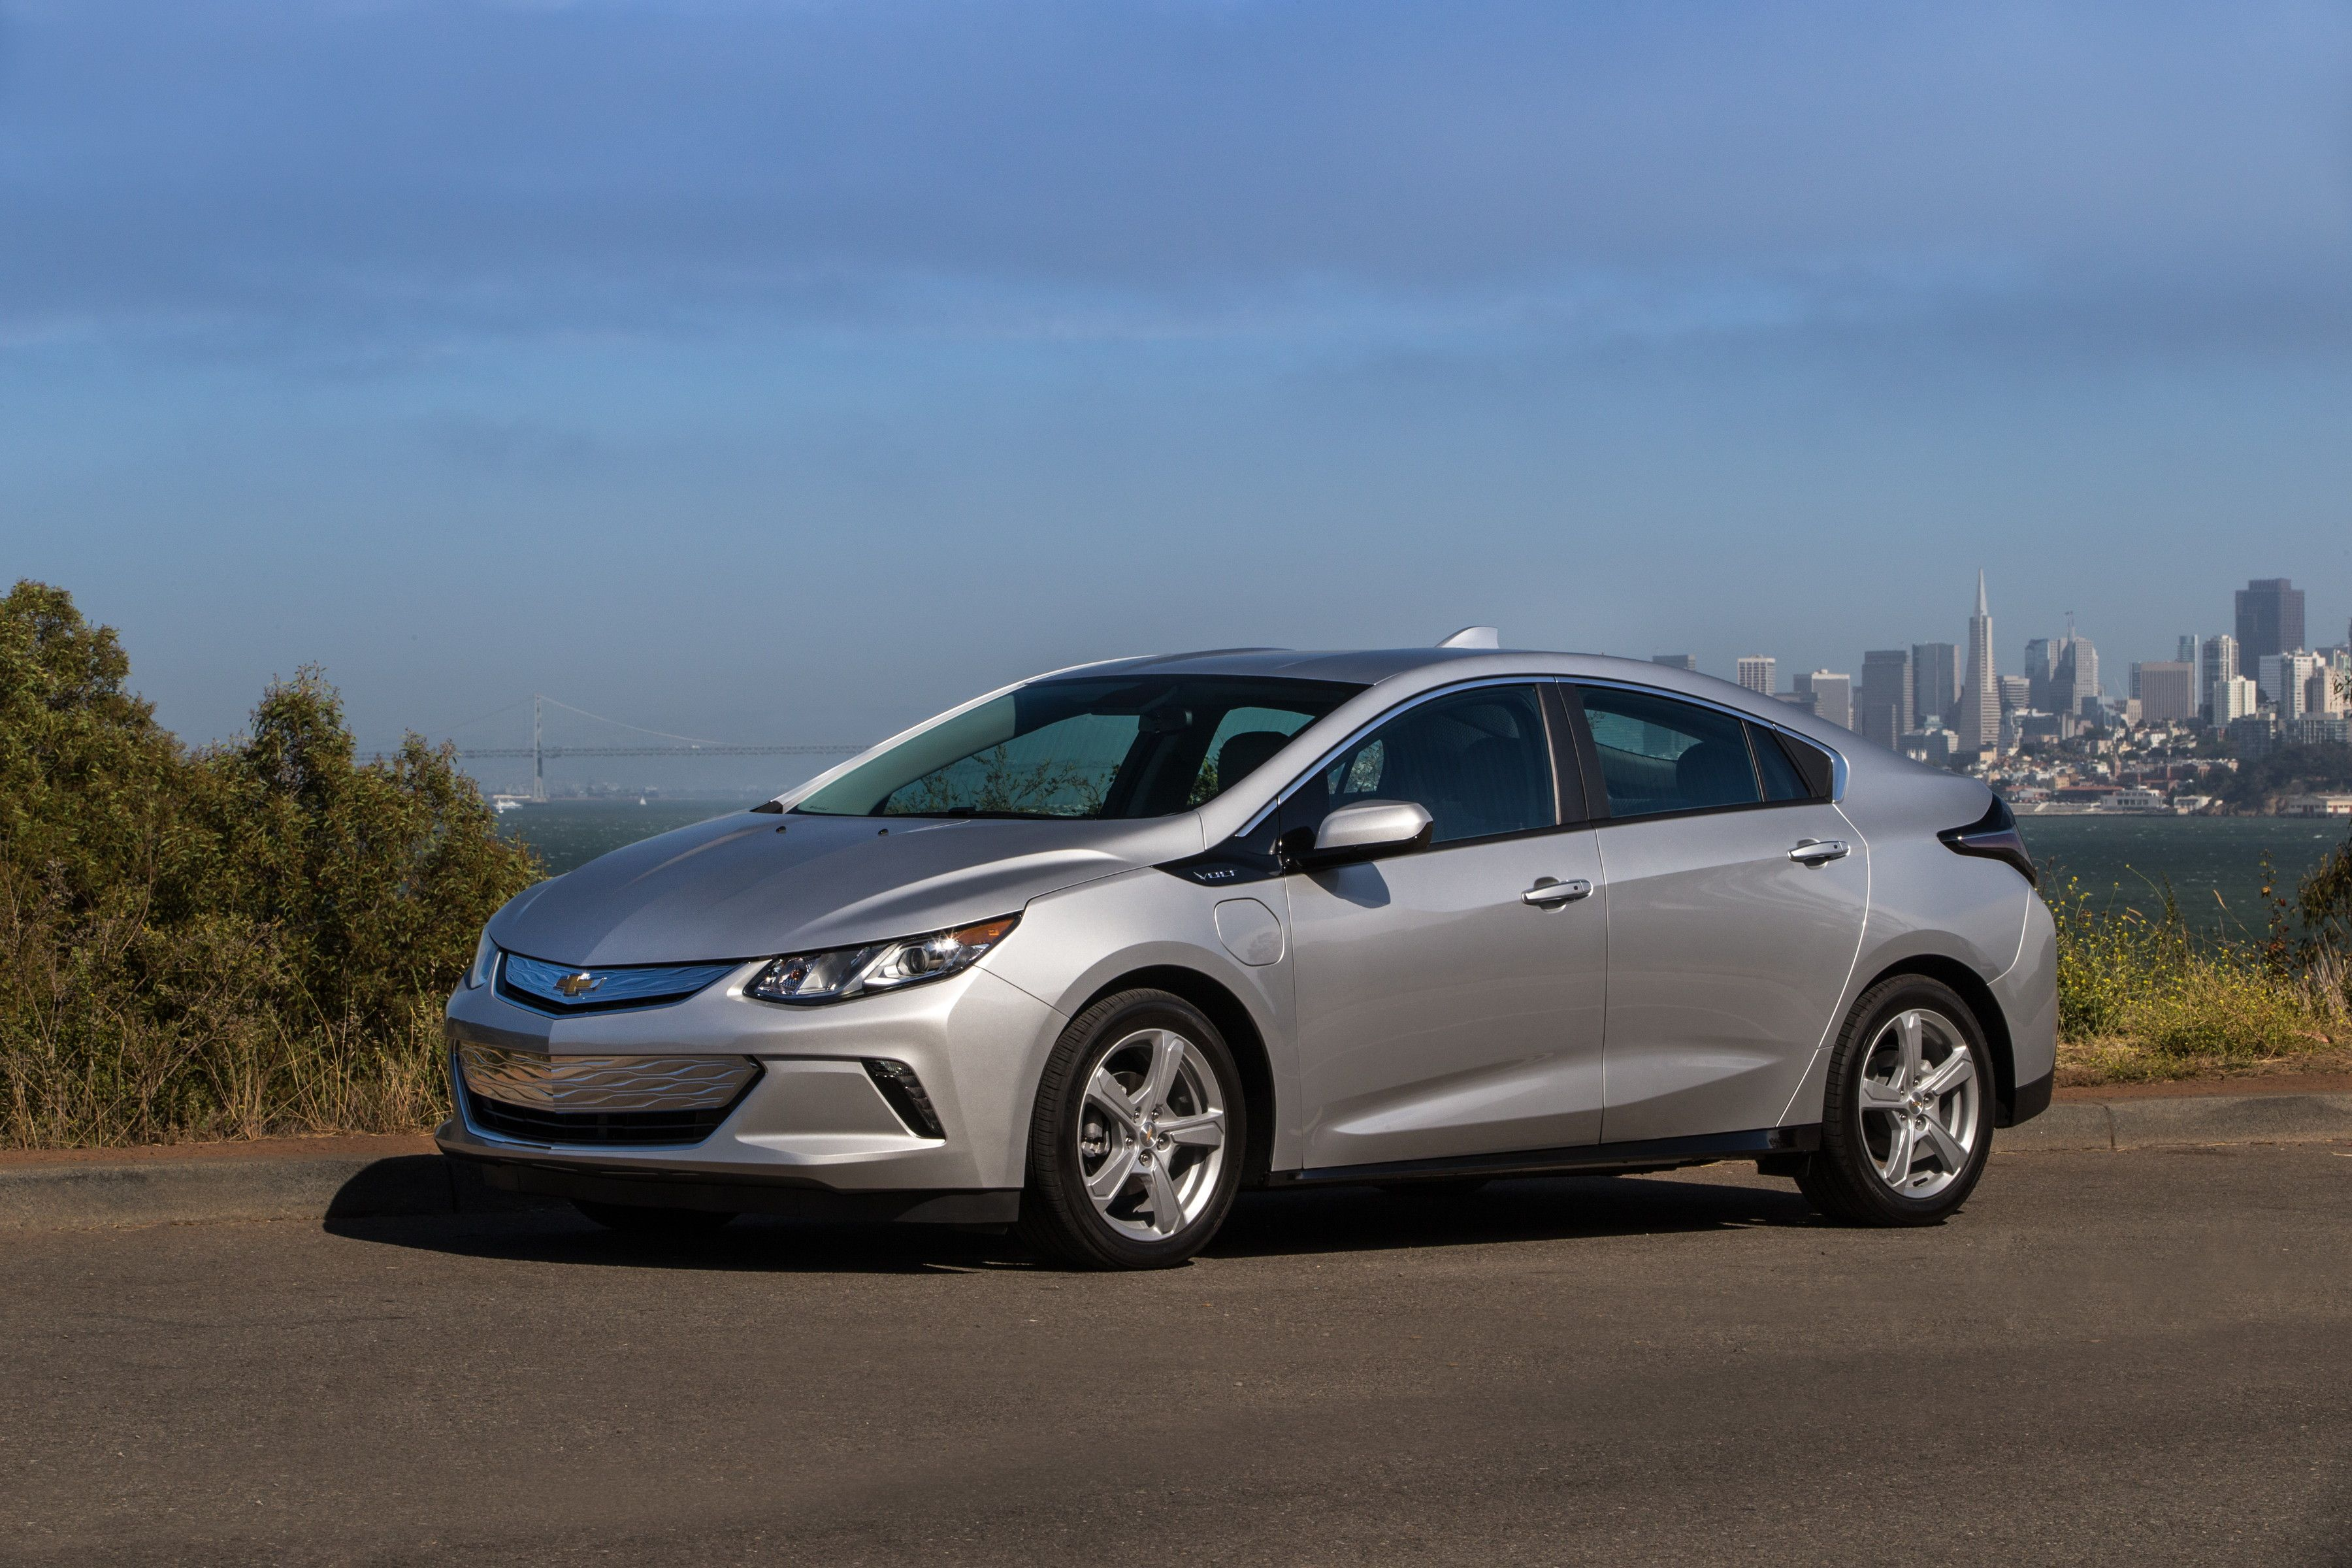 Blog In 2020 Chevrolet Volt Chevy Volt Hybrid Car